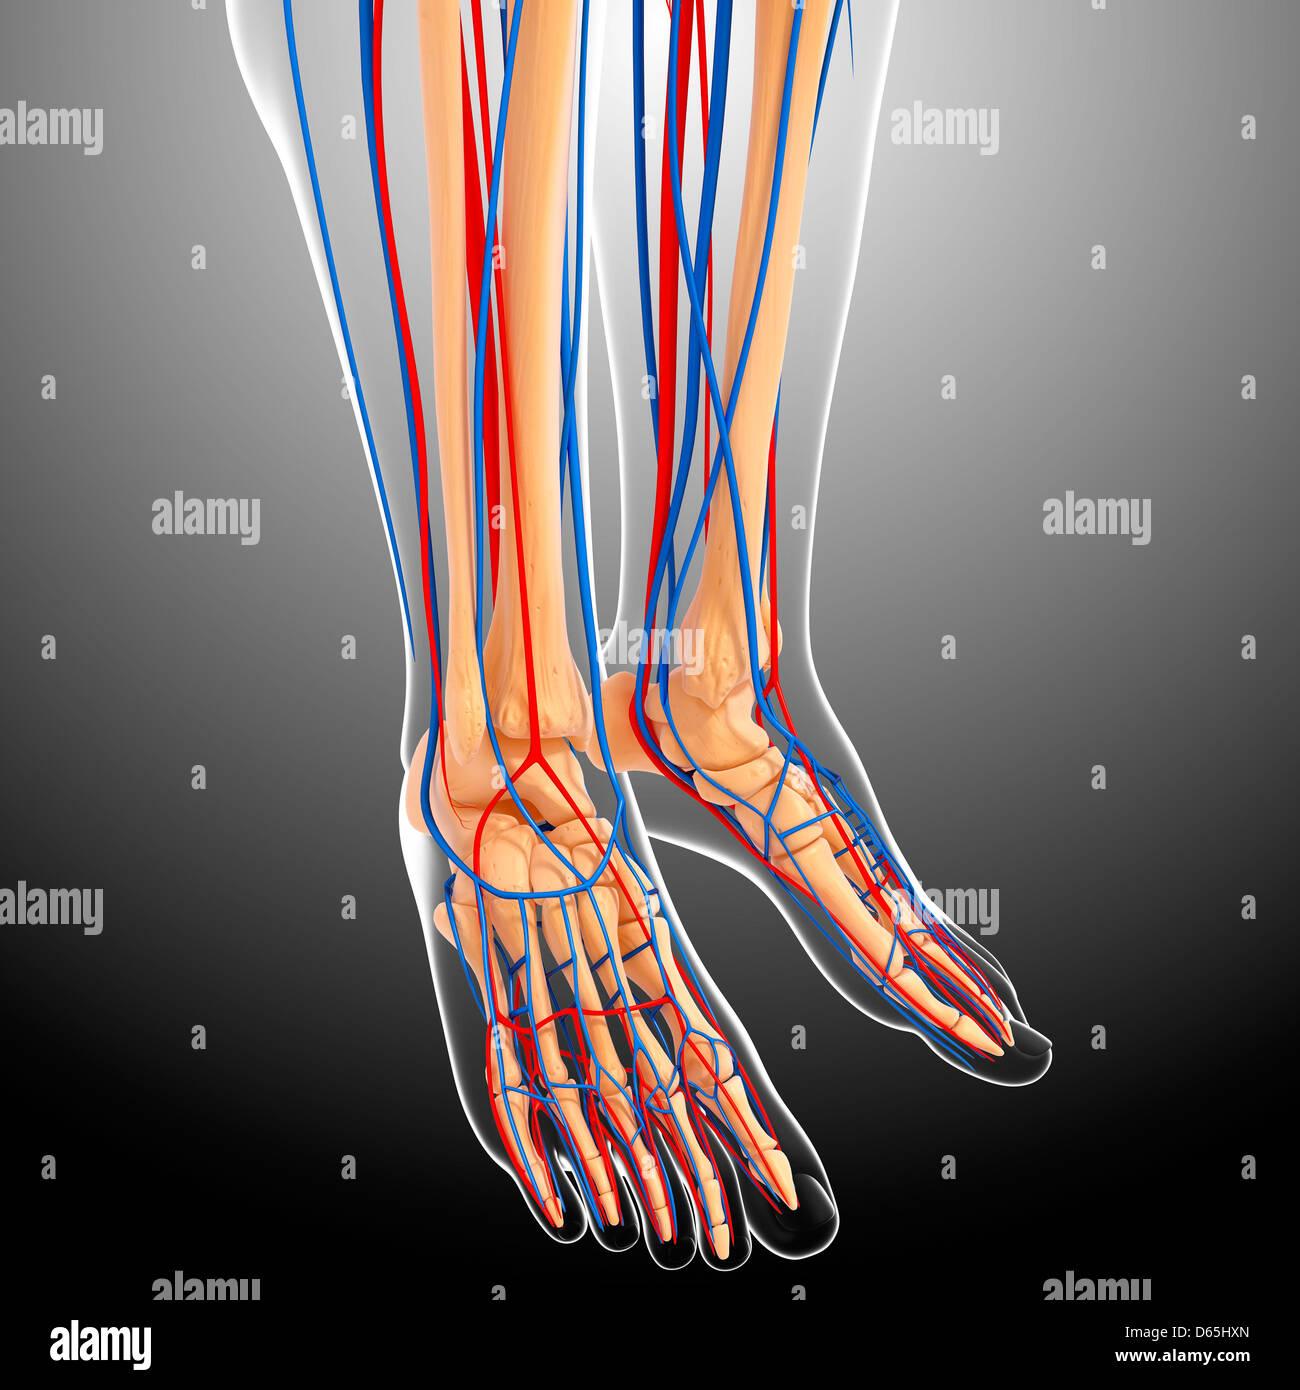 lower leg anatomy, artwork - Stock Image